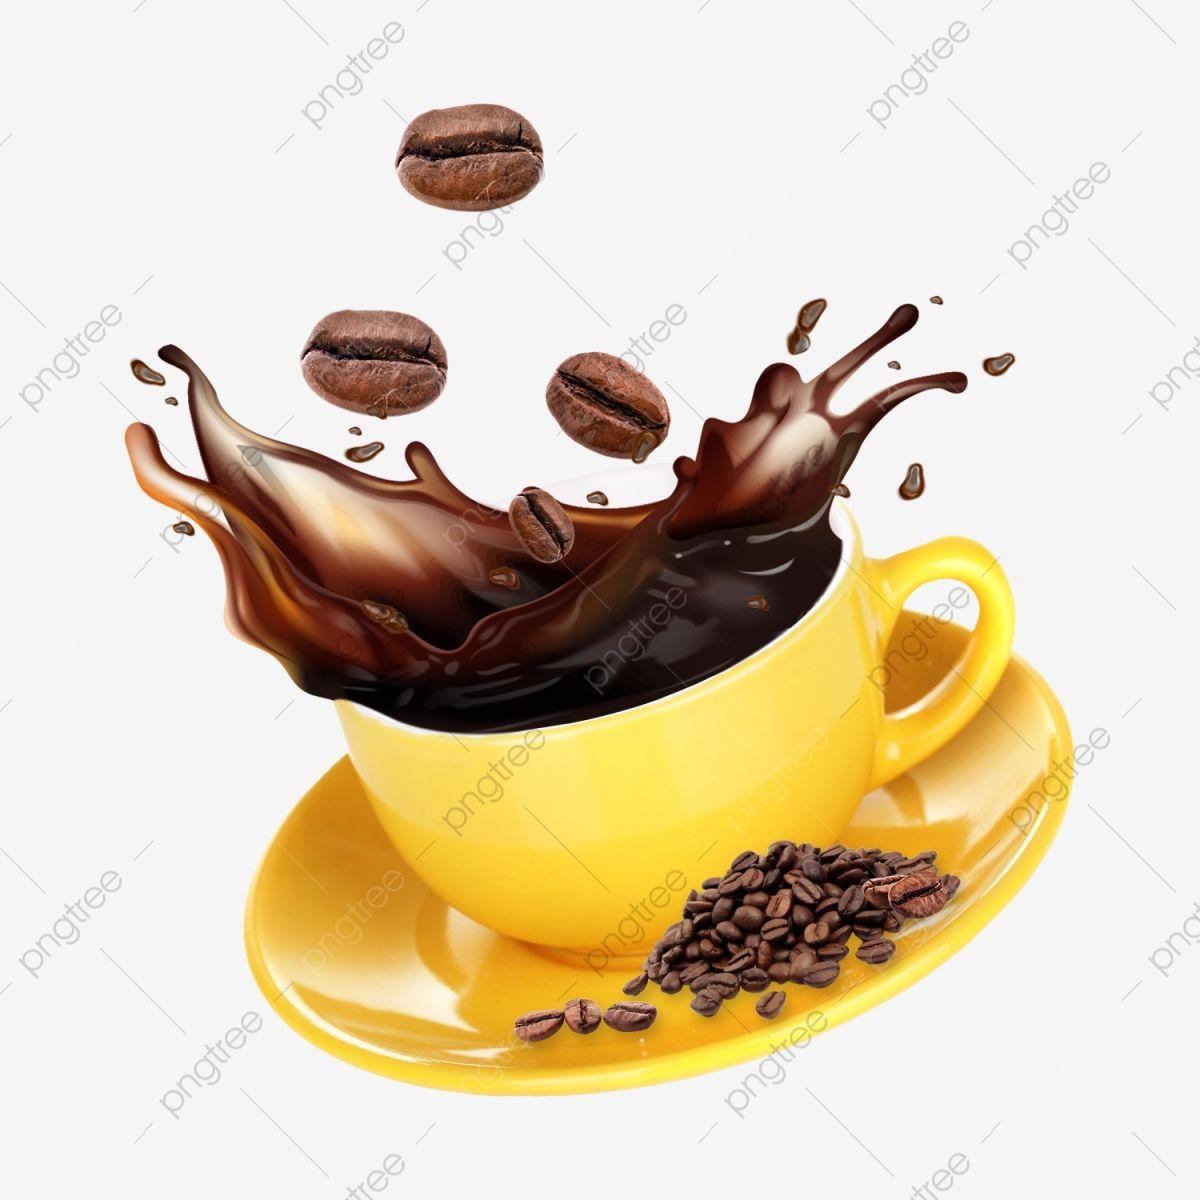 Pin On Fondos Wallpaper coffee beans coffee ice hand